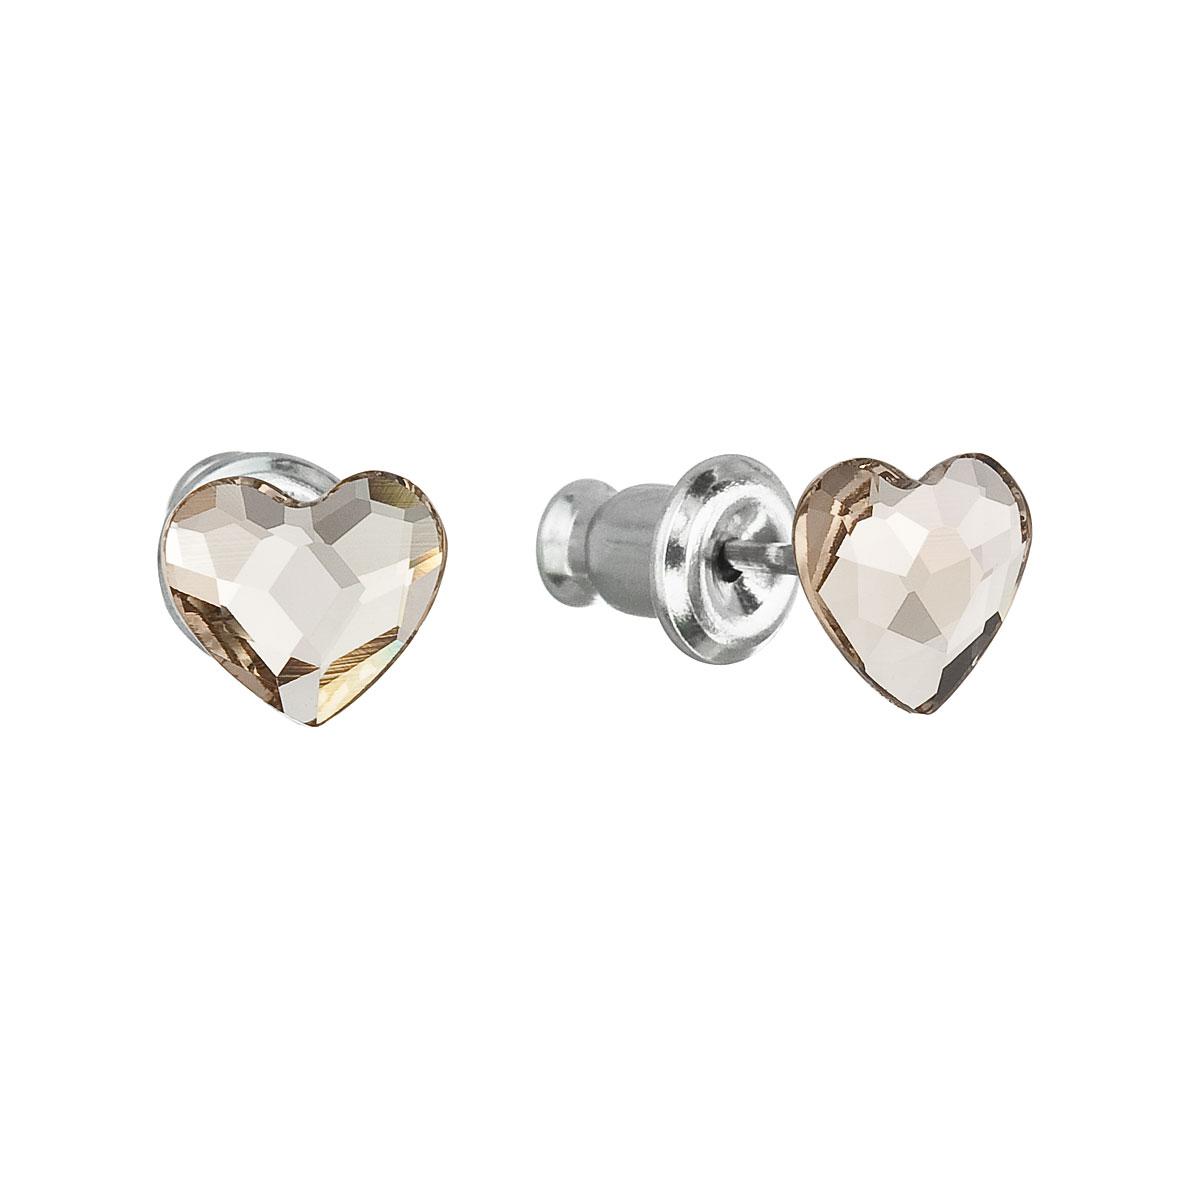 Náušnice bižutéria so Swarovski krištáľmi hnedé srdce 51050.3